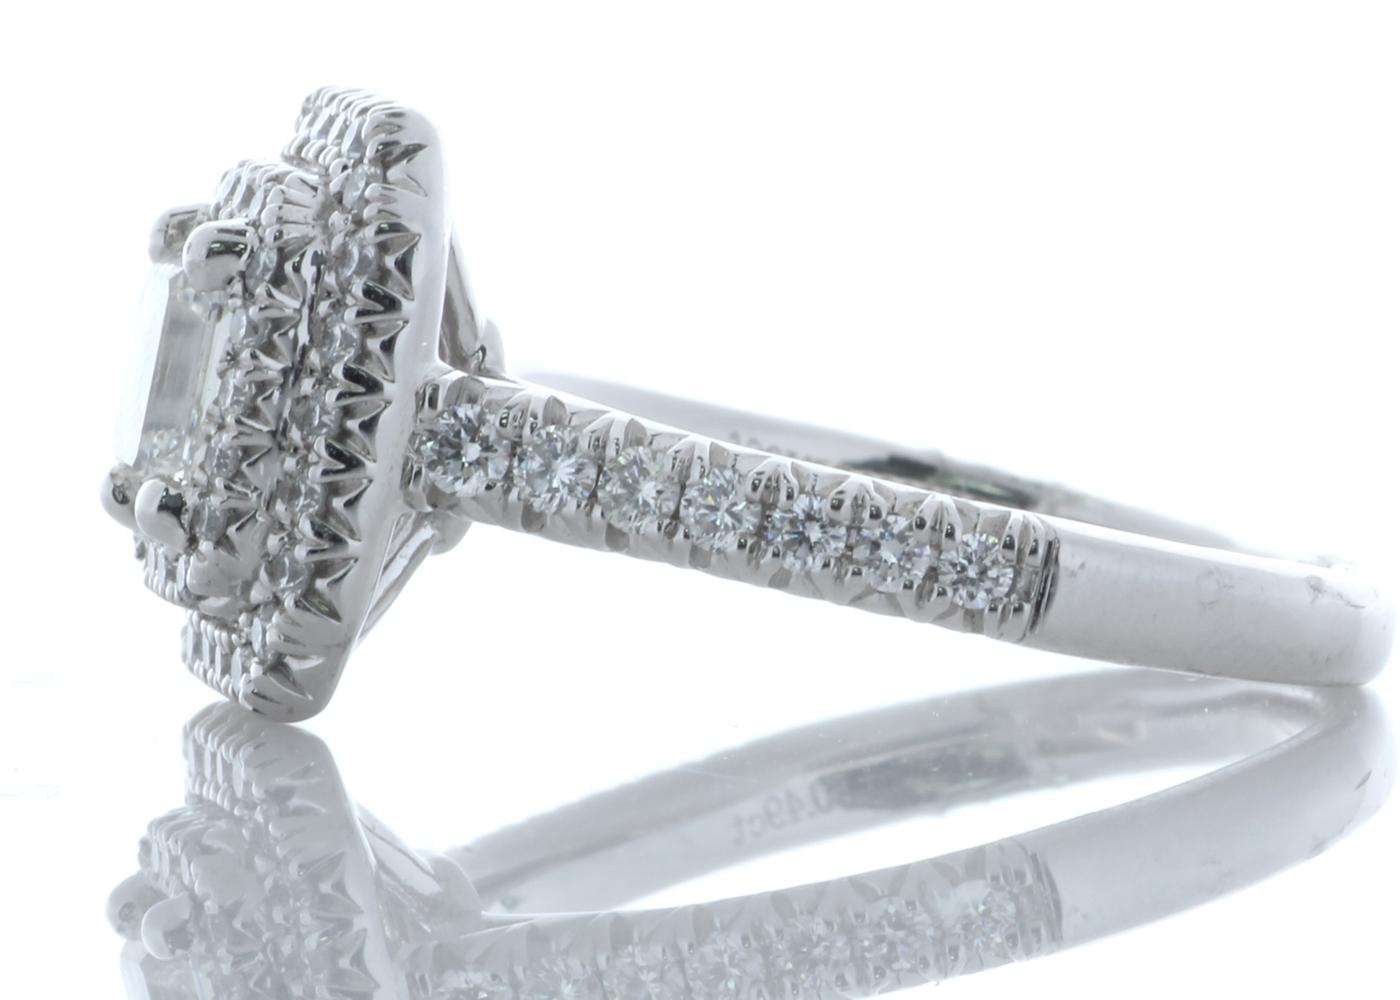 Platinum Single Stone With Halo Setting Ring 0.99 Carats - Image 4 of 4